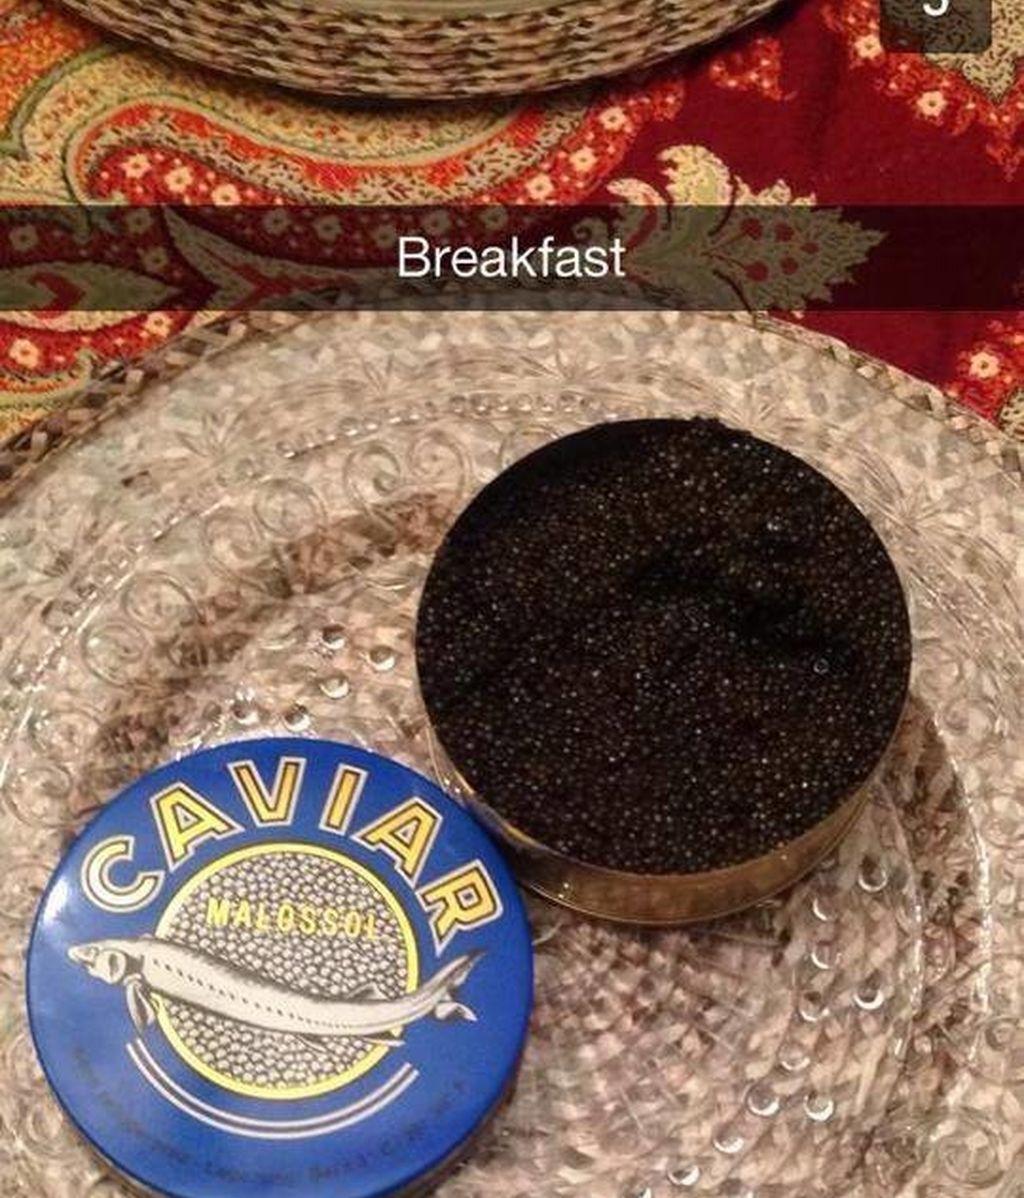 De desayunar... ¡caviar!